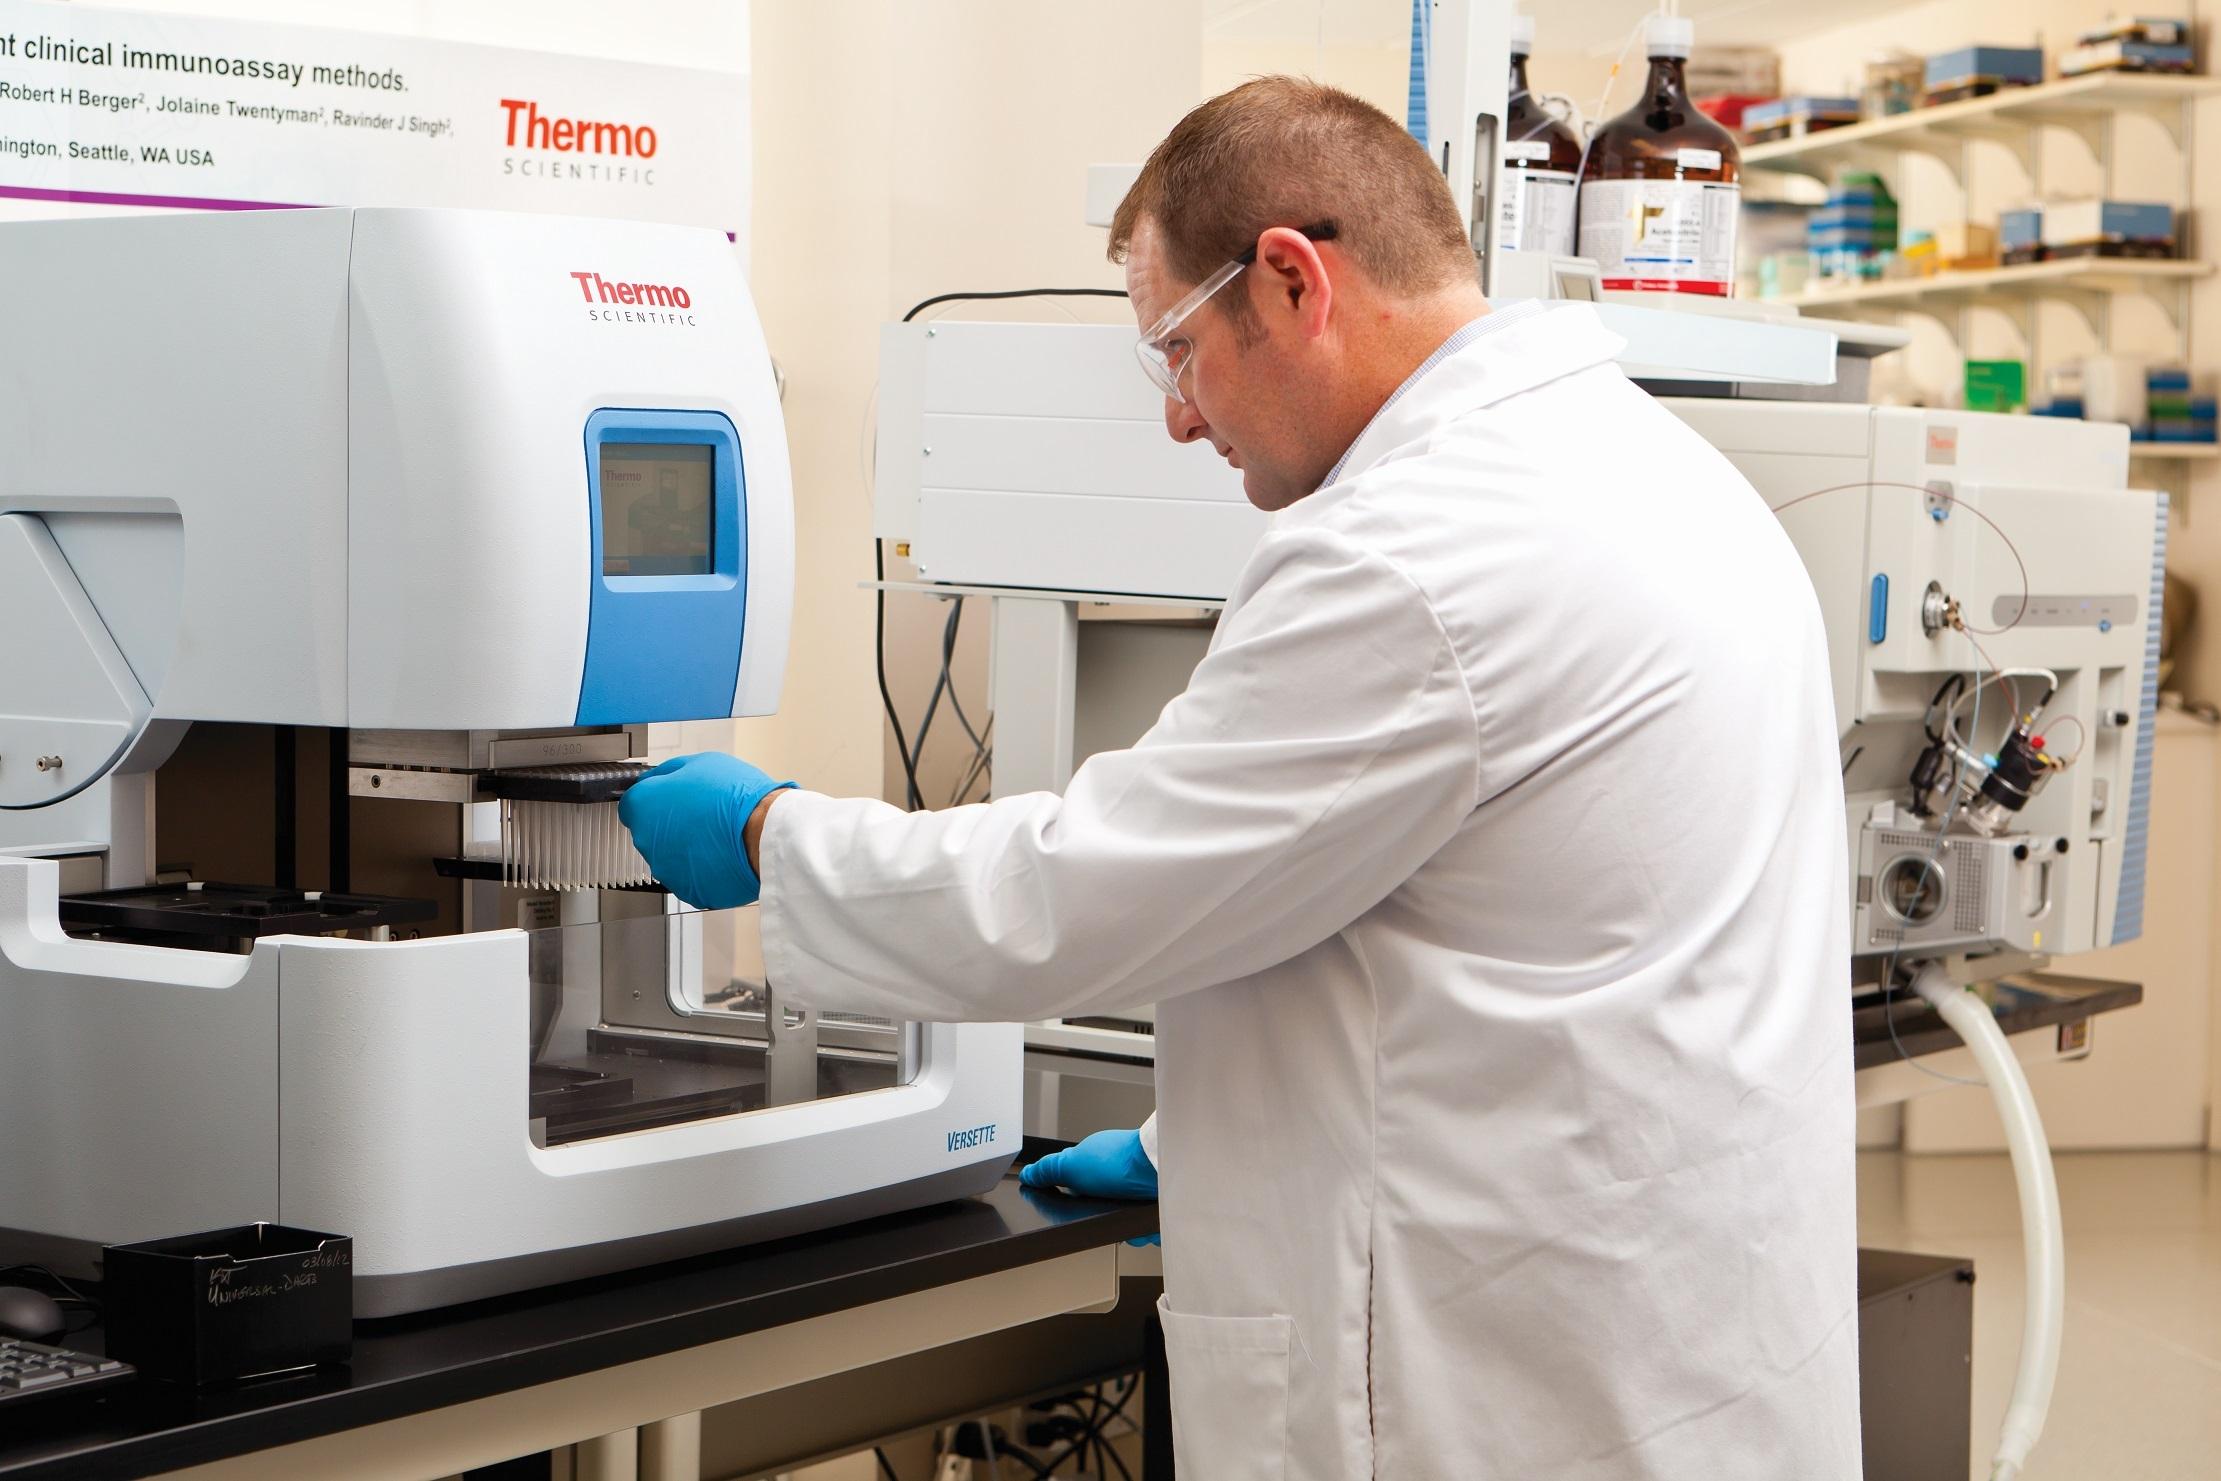 New Mass Spectrometric Immunoassay Consumables Enable ...